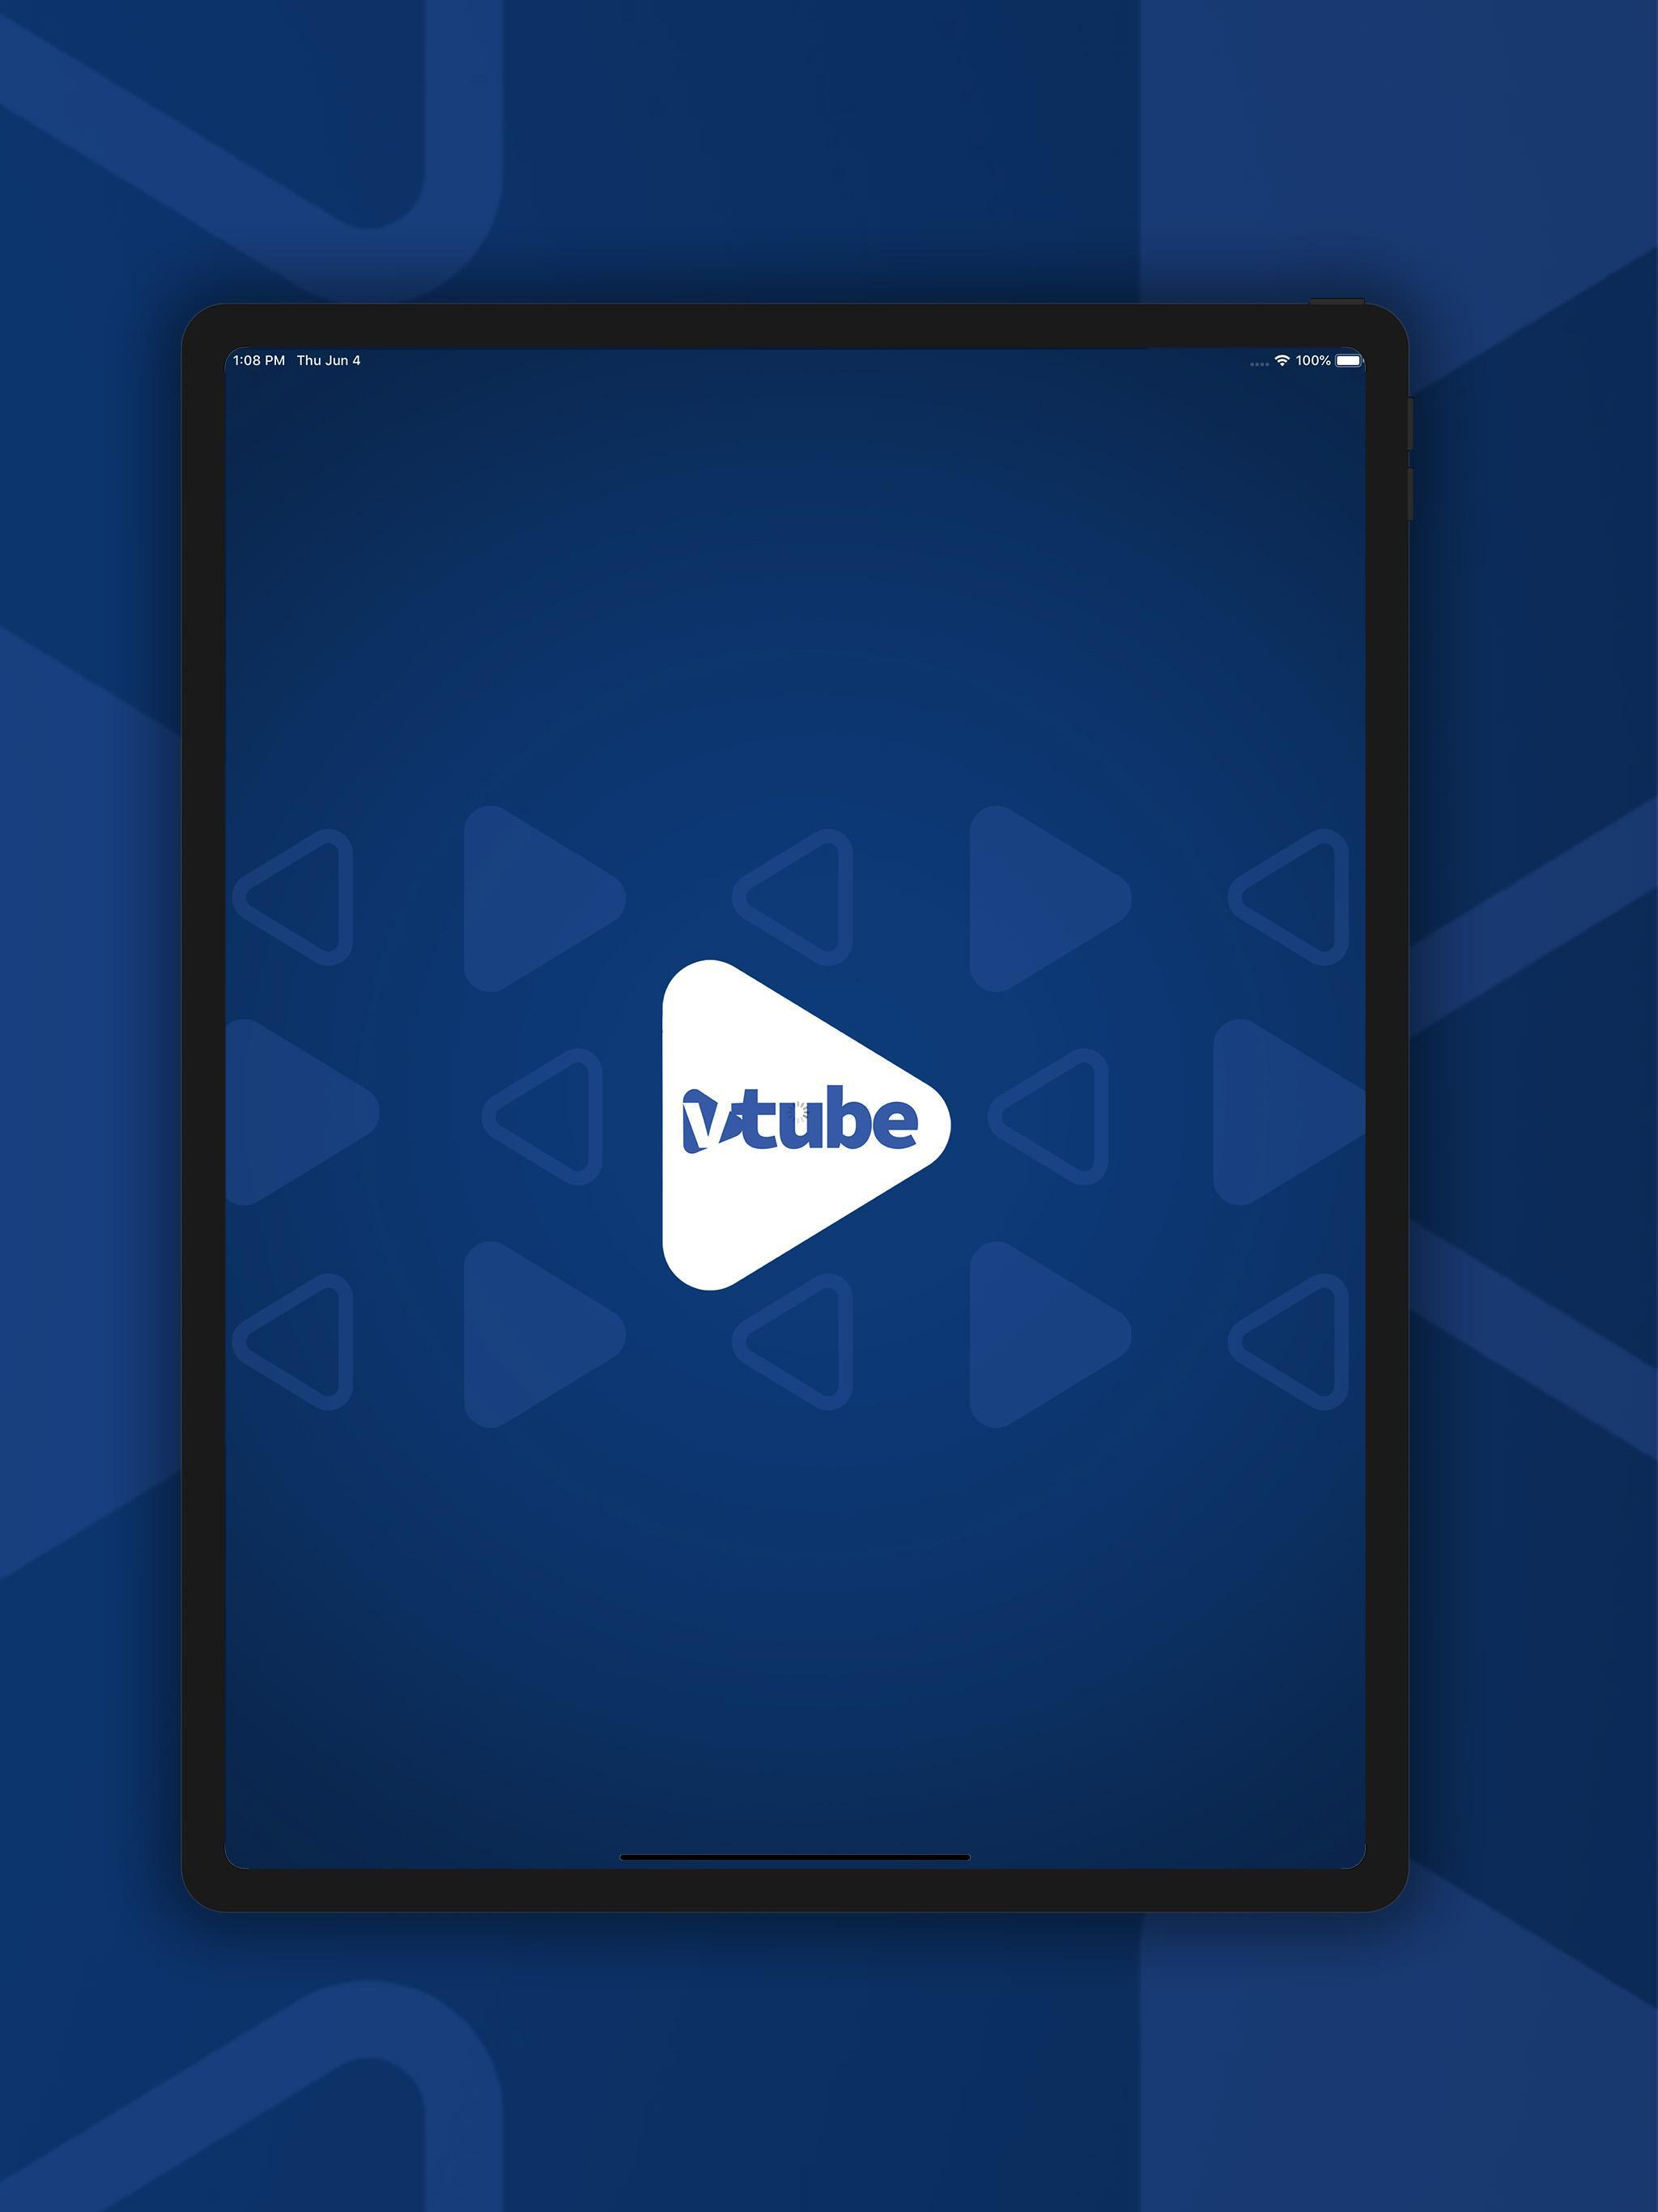 Vtube For Android Apk Download